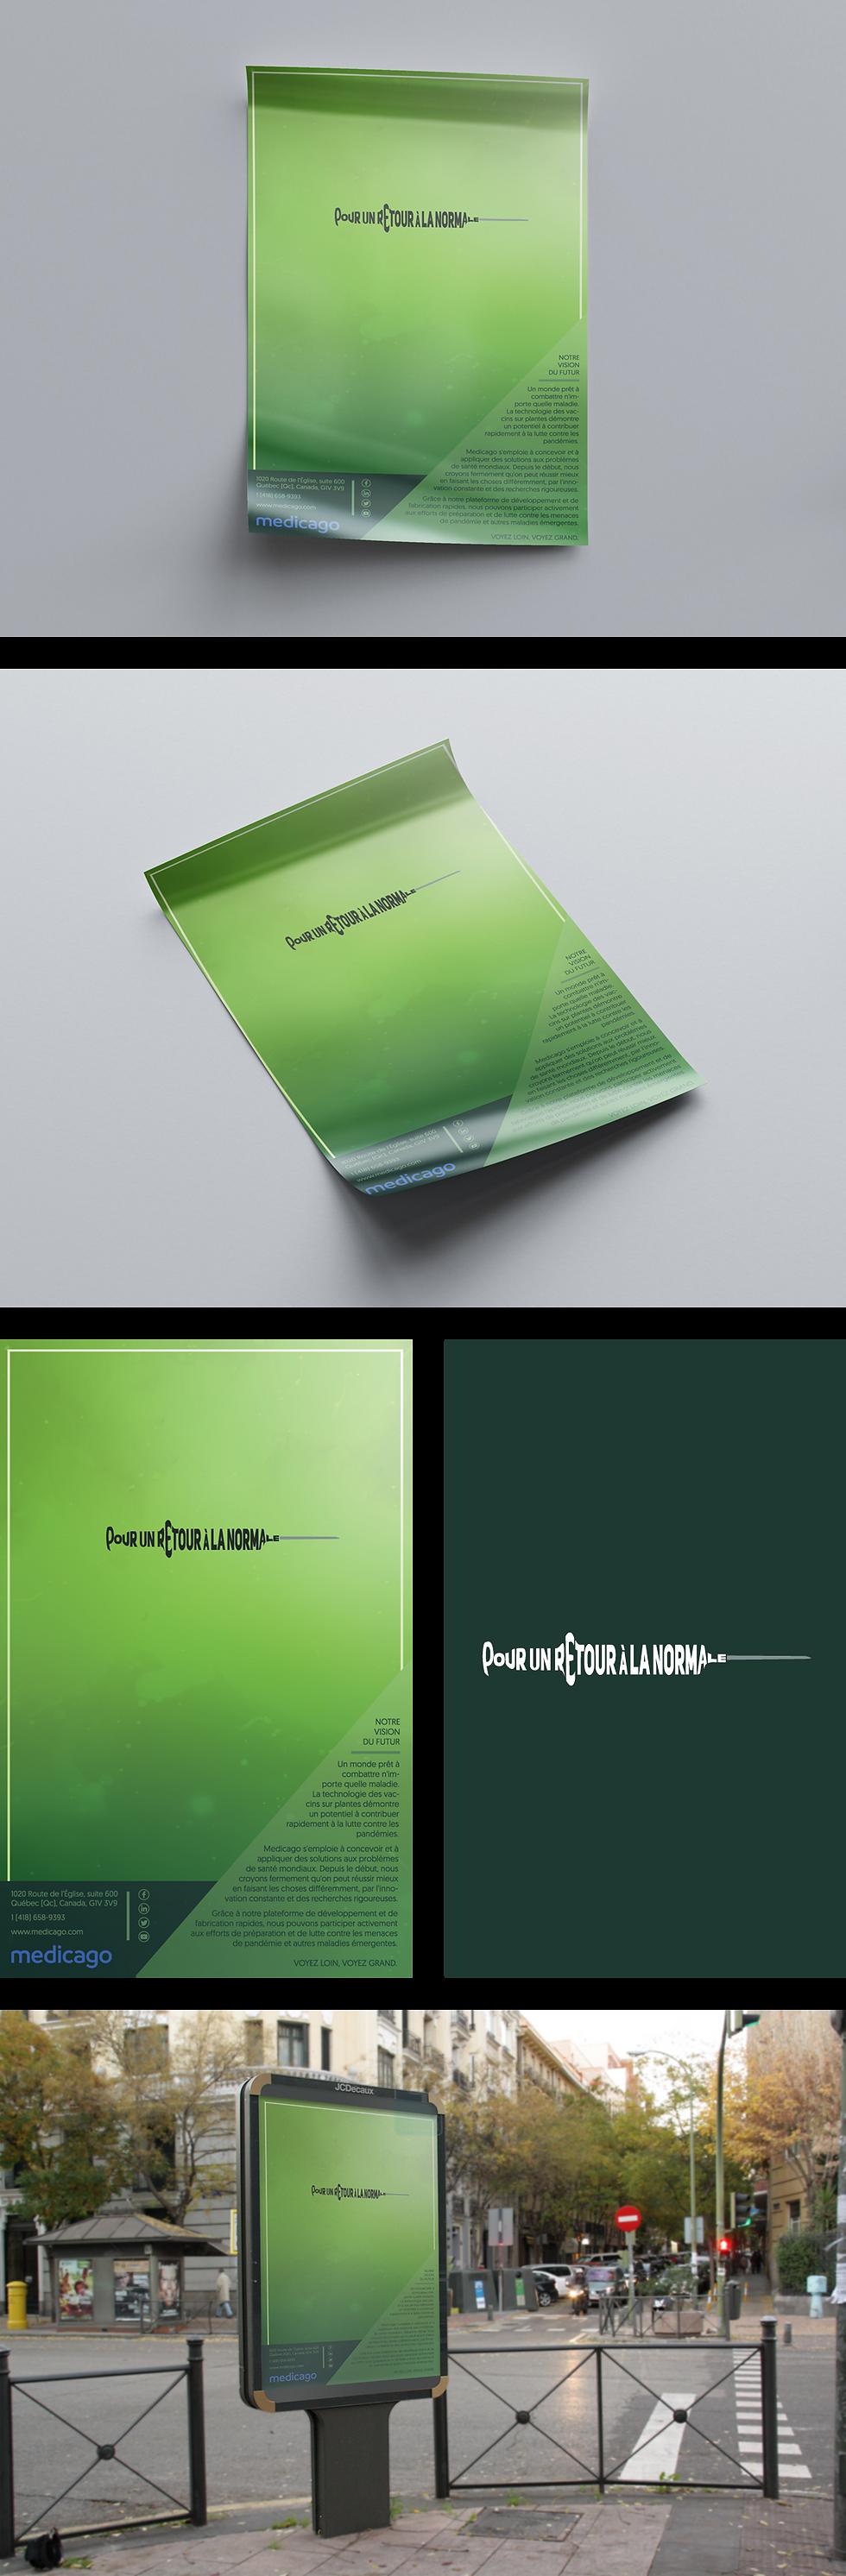 Design affiche Medicago